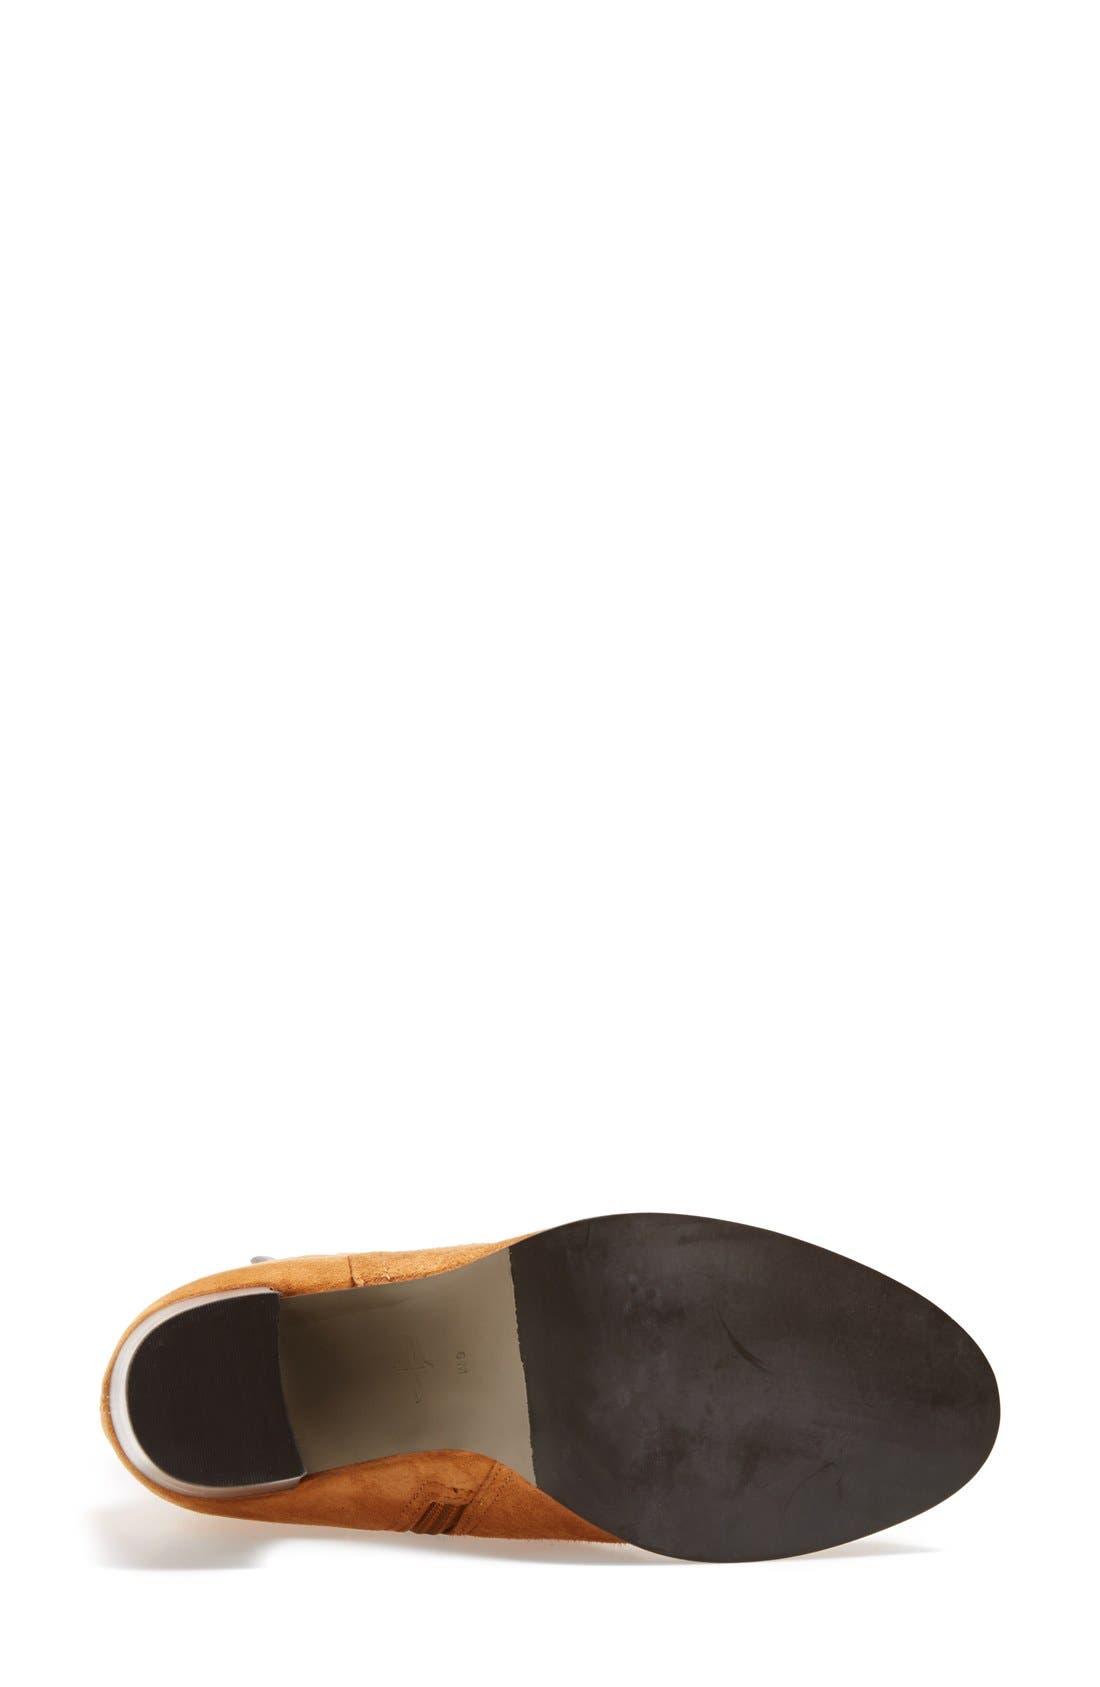 Alternate Image 4  - Pour la Victoire 'Talia' Suede Tall Boot (Women)